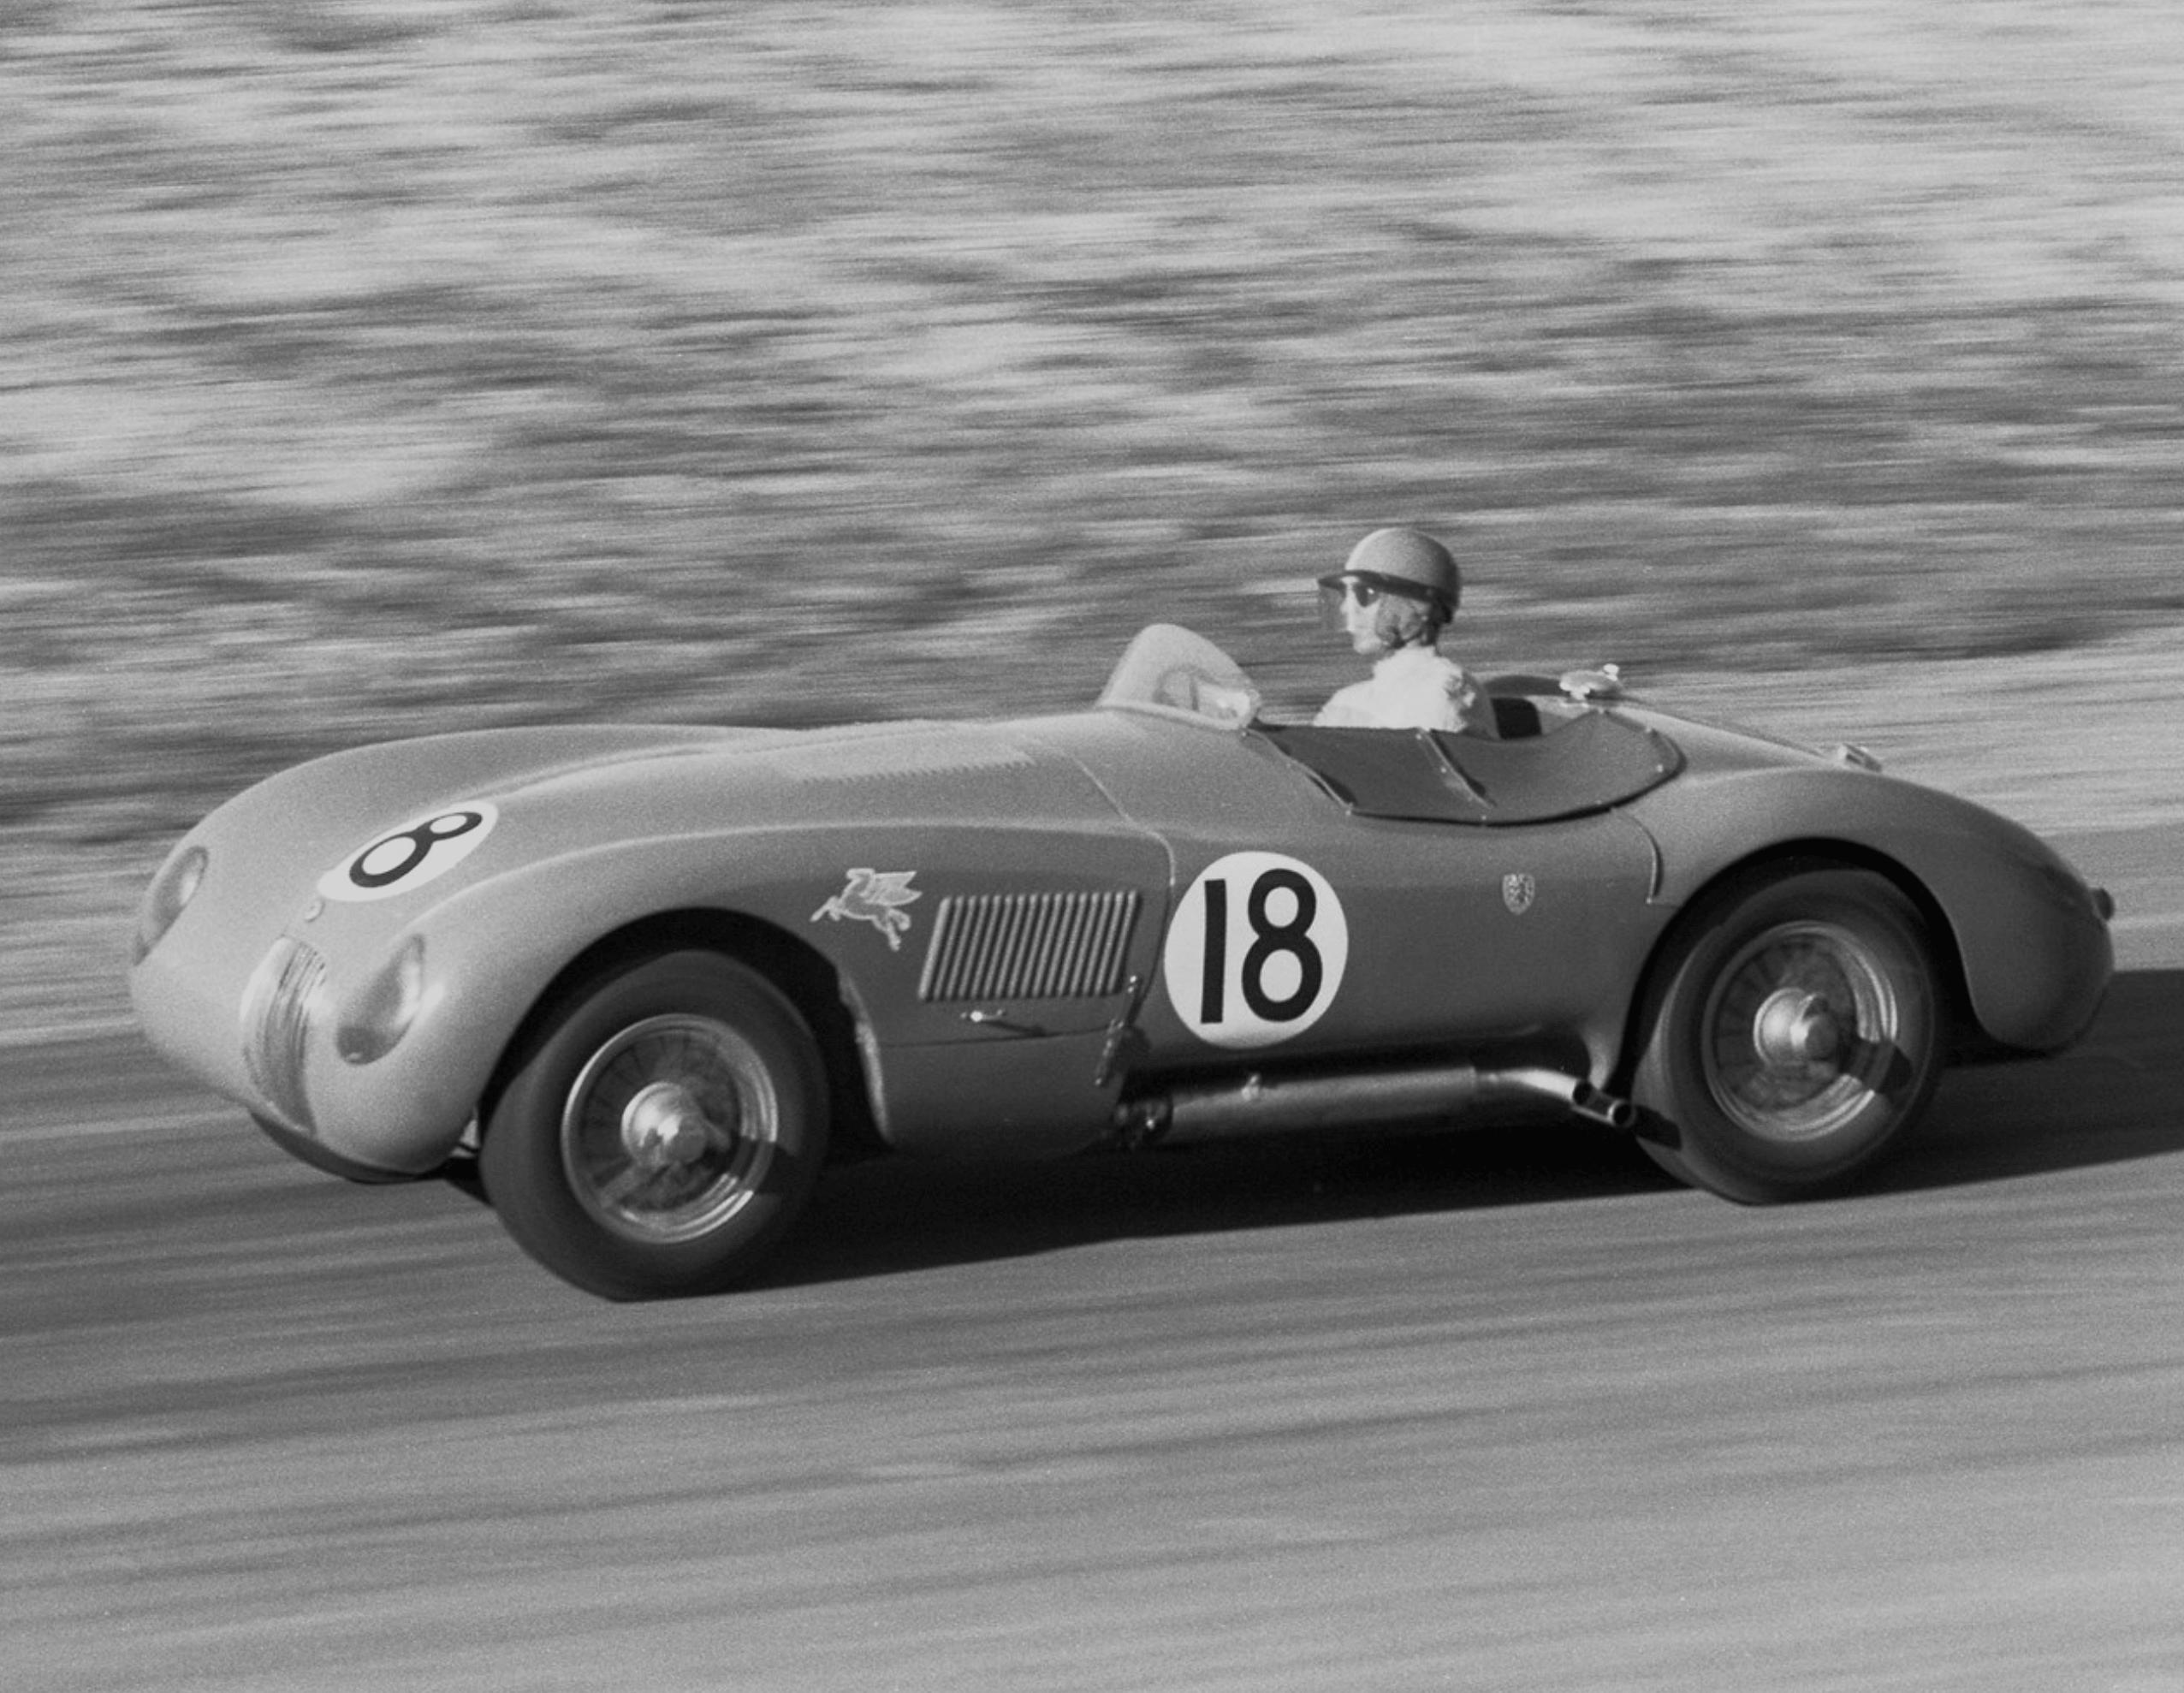 classic services for jaguar motorcar sale of treasured